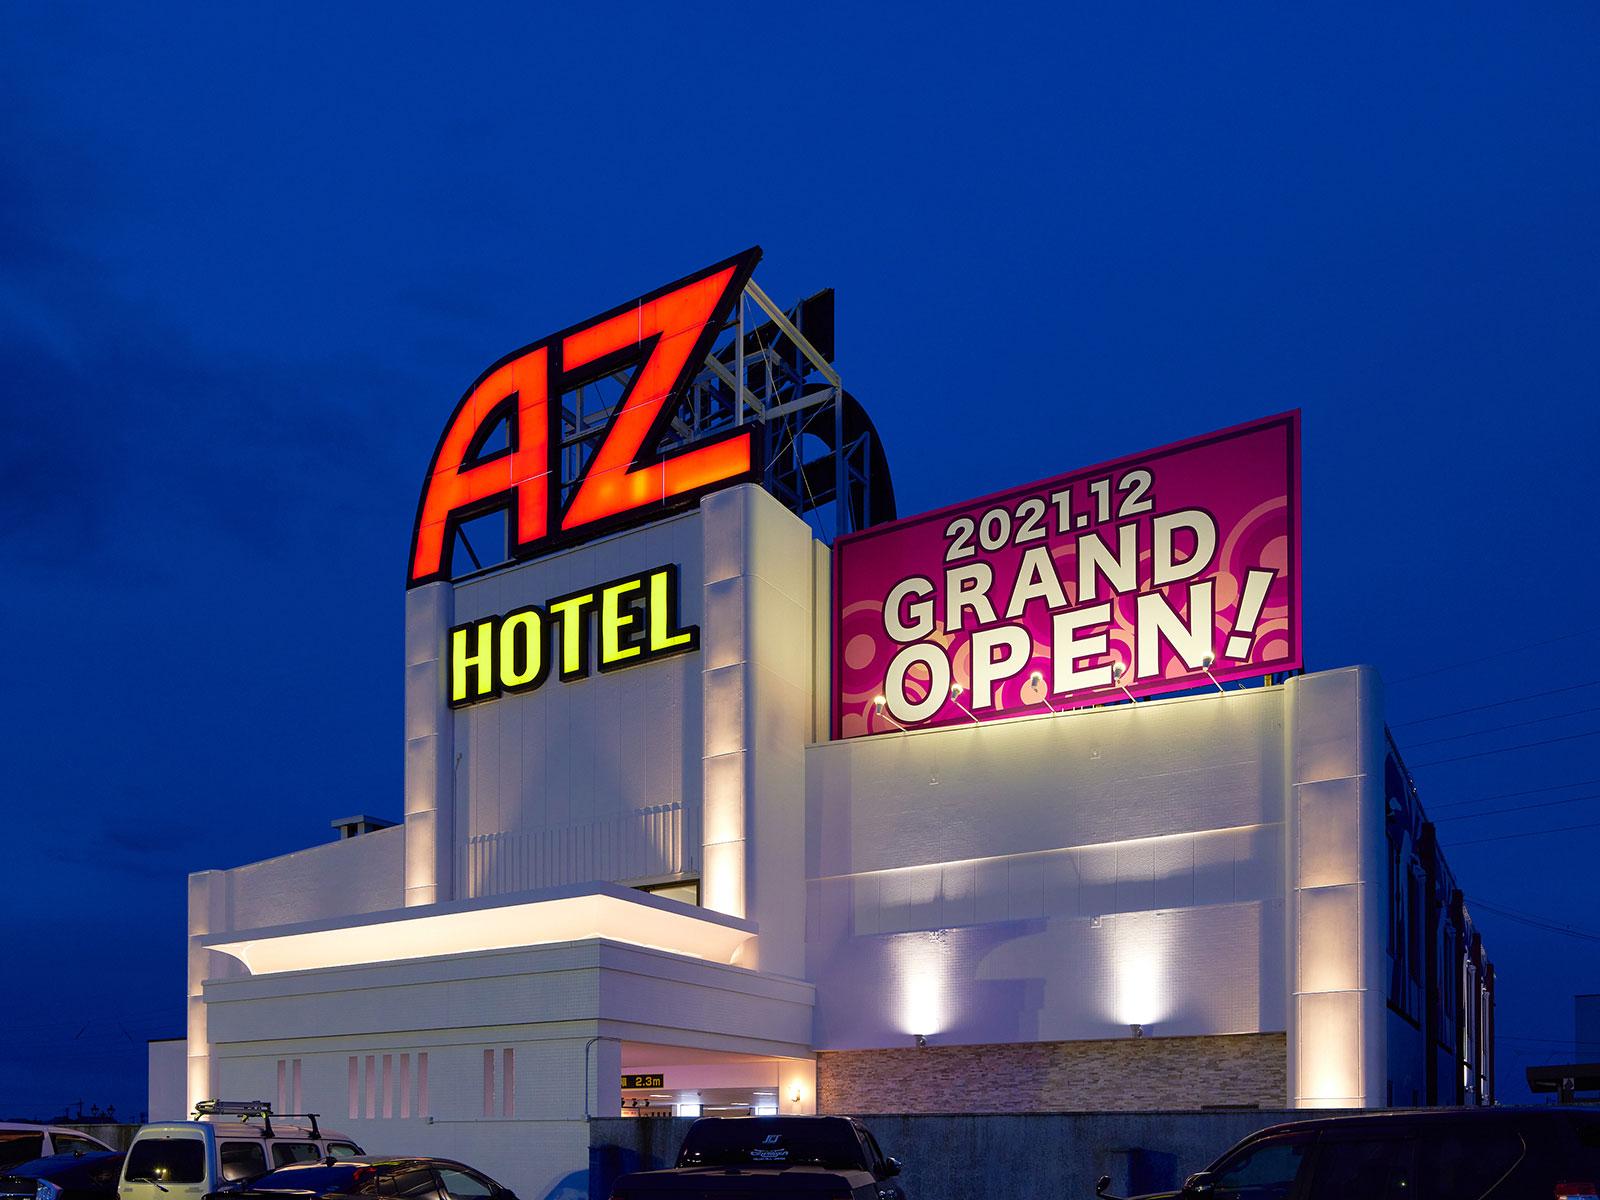 HOTEL AZ丸岡店(ホテル エーゼット)